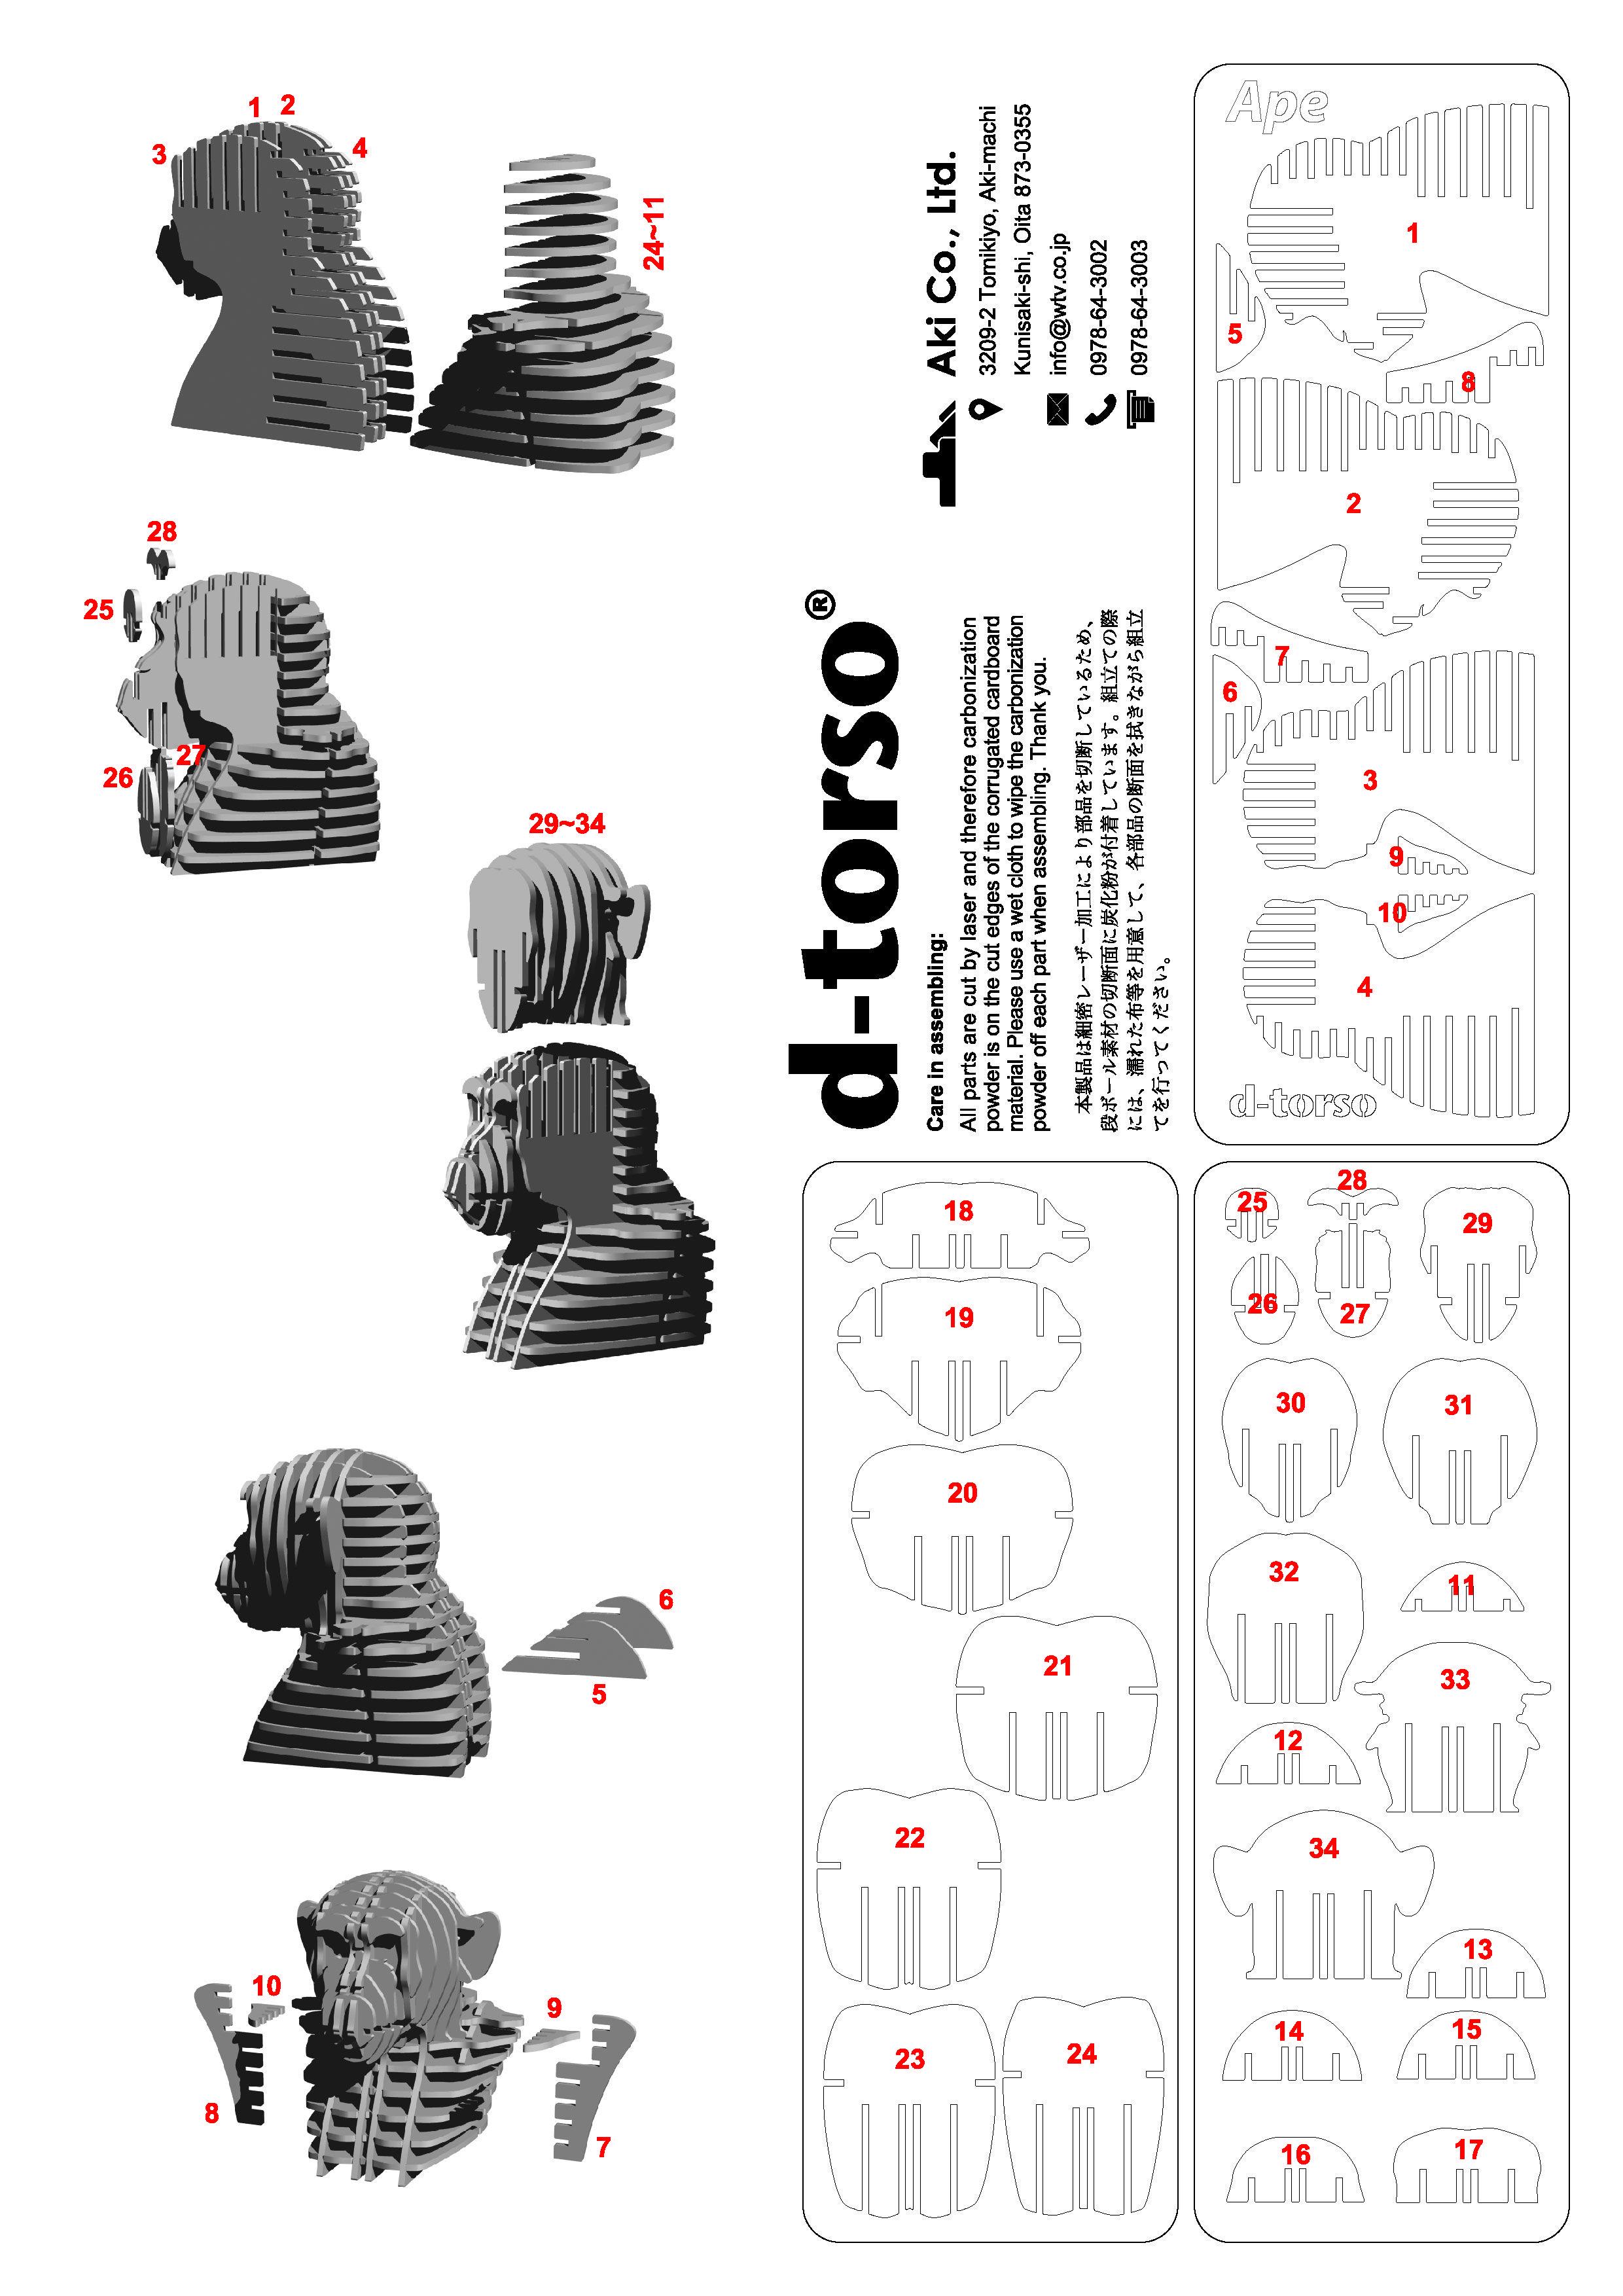 Ape082_white | animales | Pinterest | Laser, Cartón y CNC